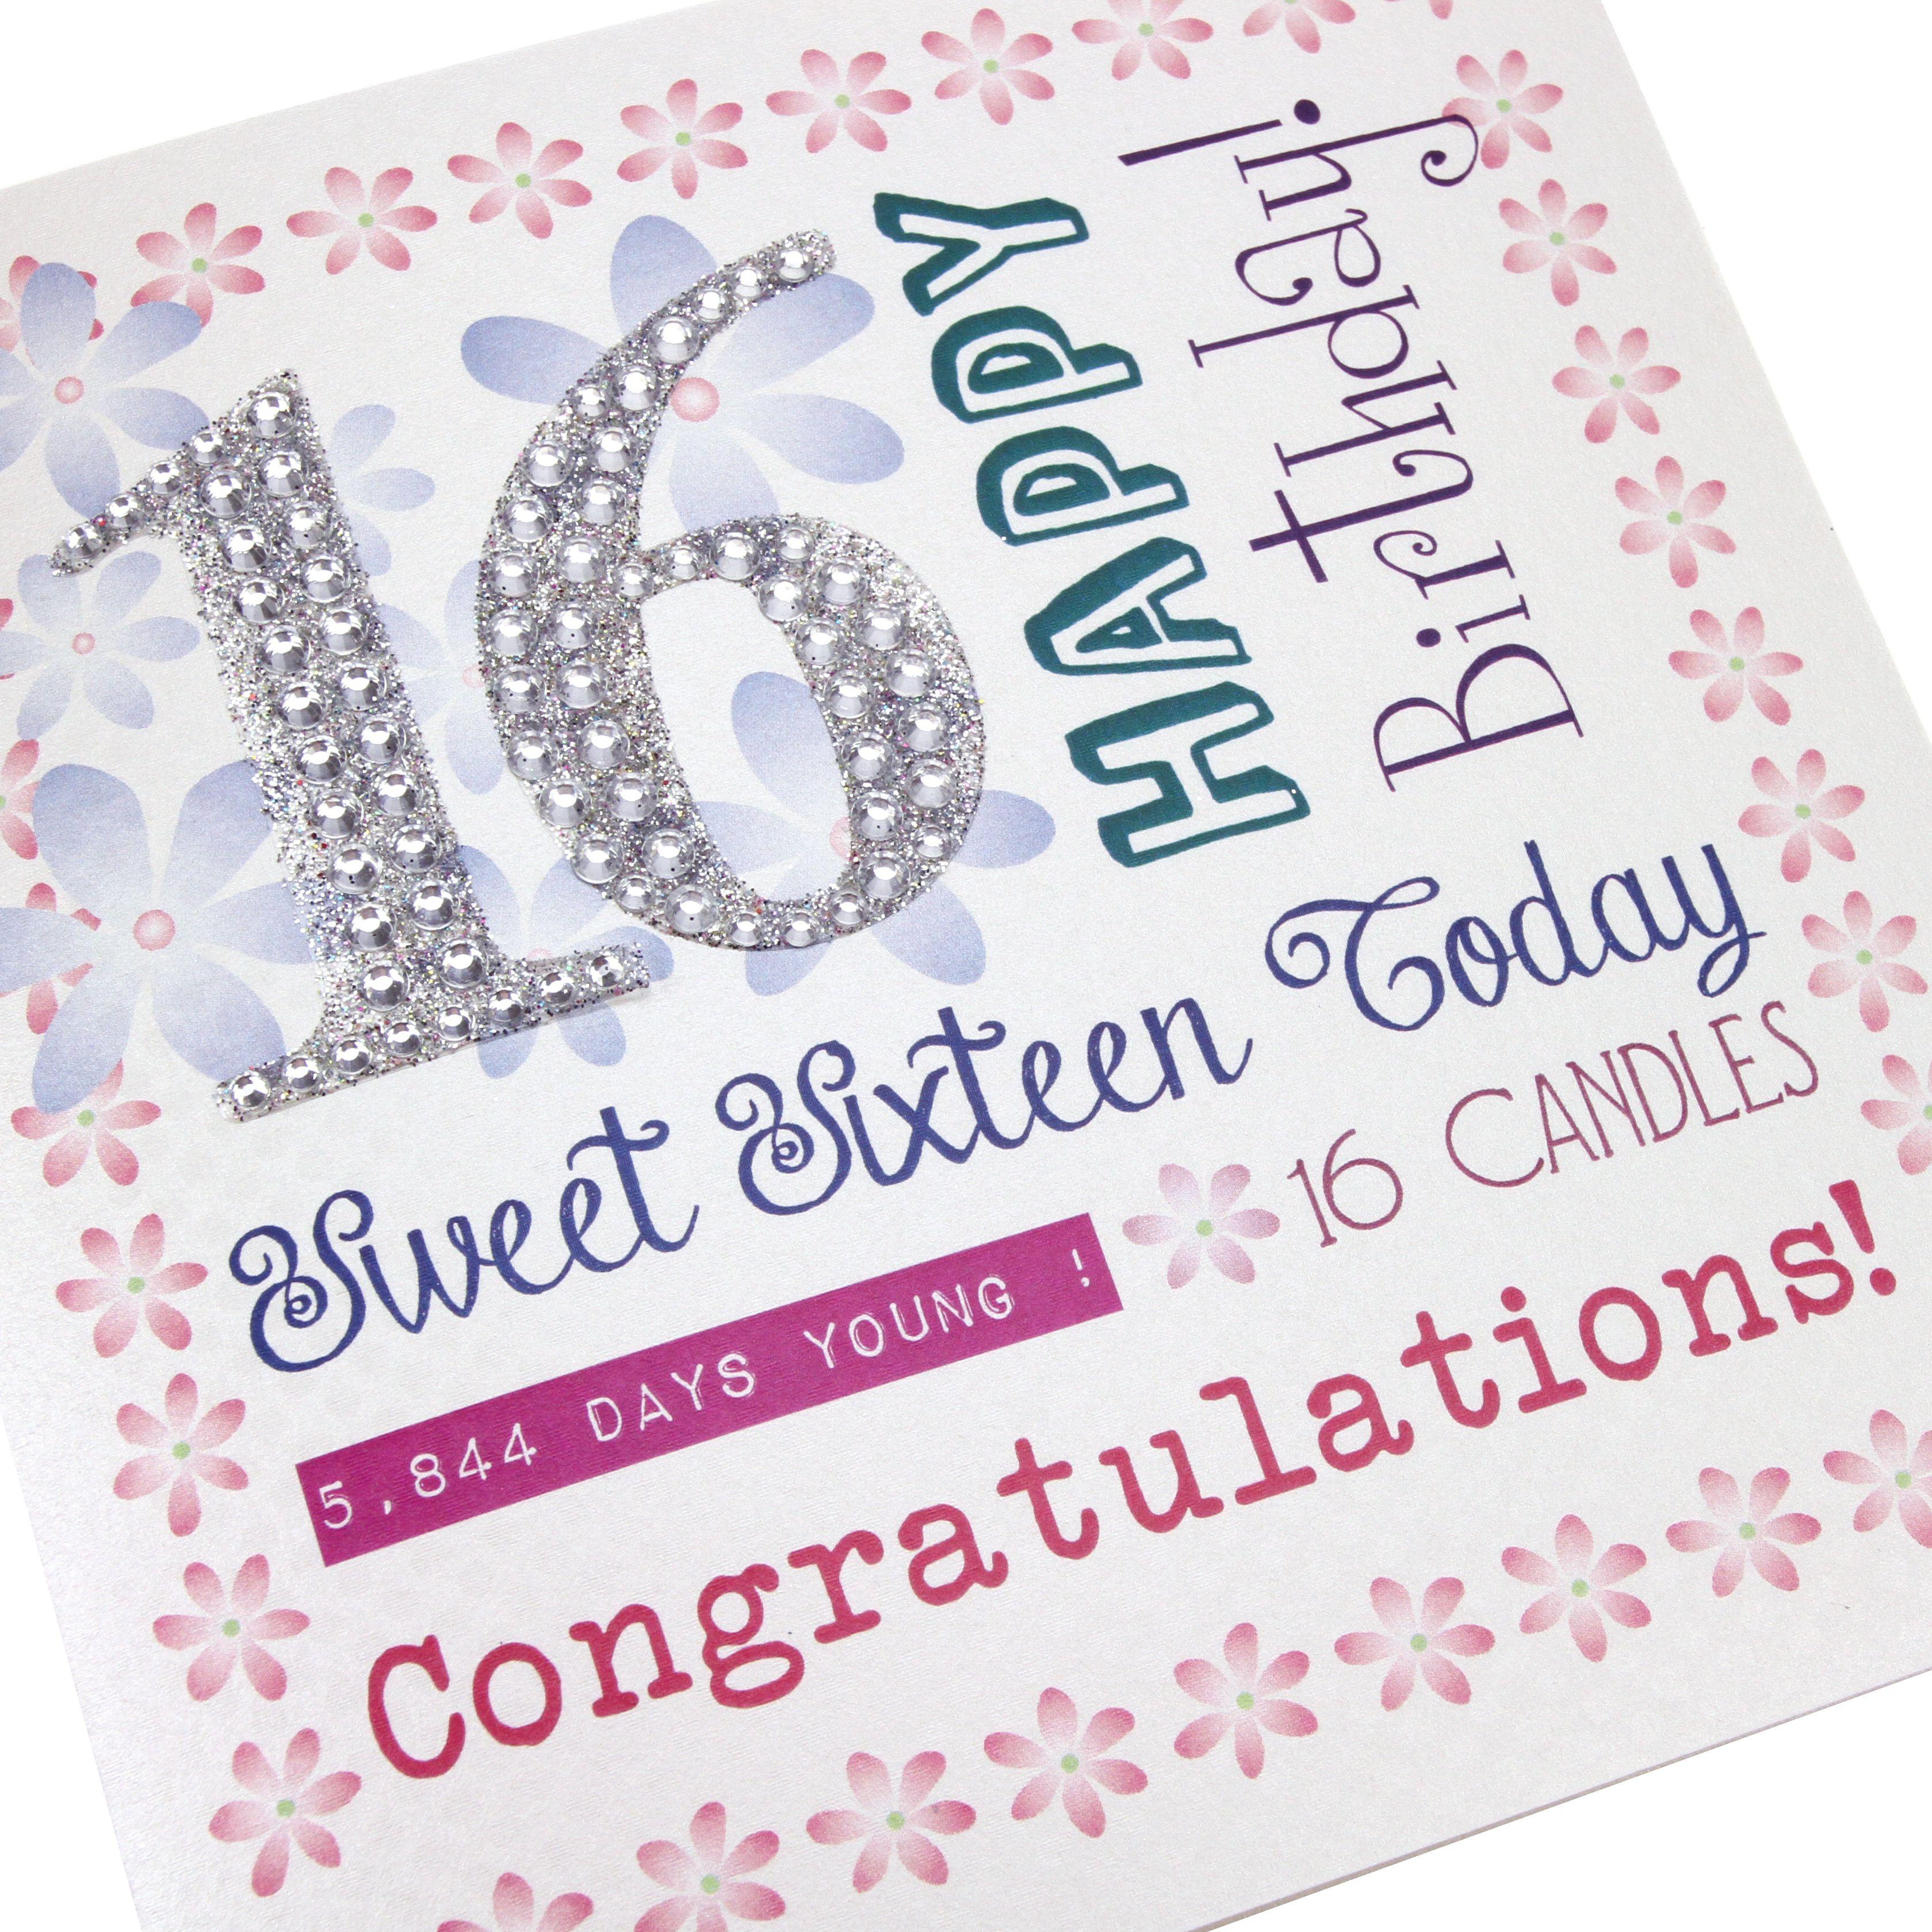 Happy 16th Birthday Gift Ideas Spaceform Sweet Sixteen: Handmade 16th Birthday Card Sweet 16 Pretty Flowers Border